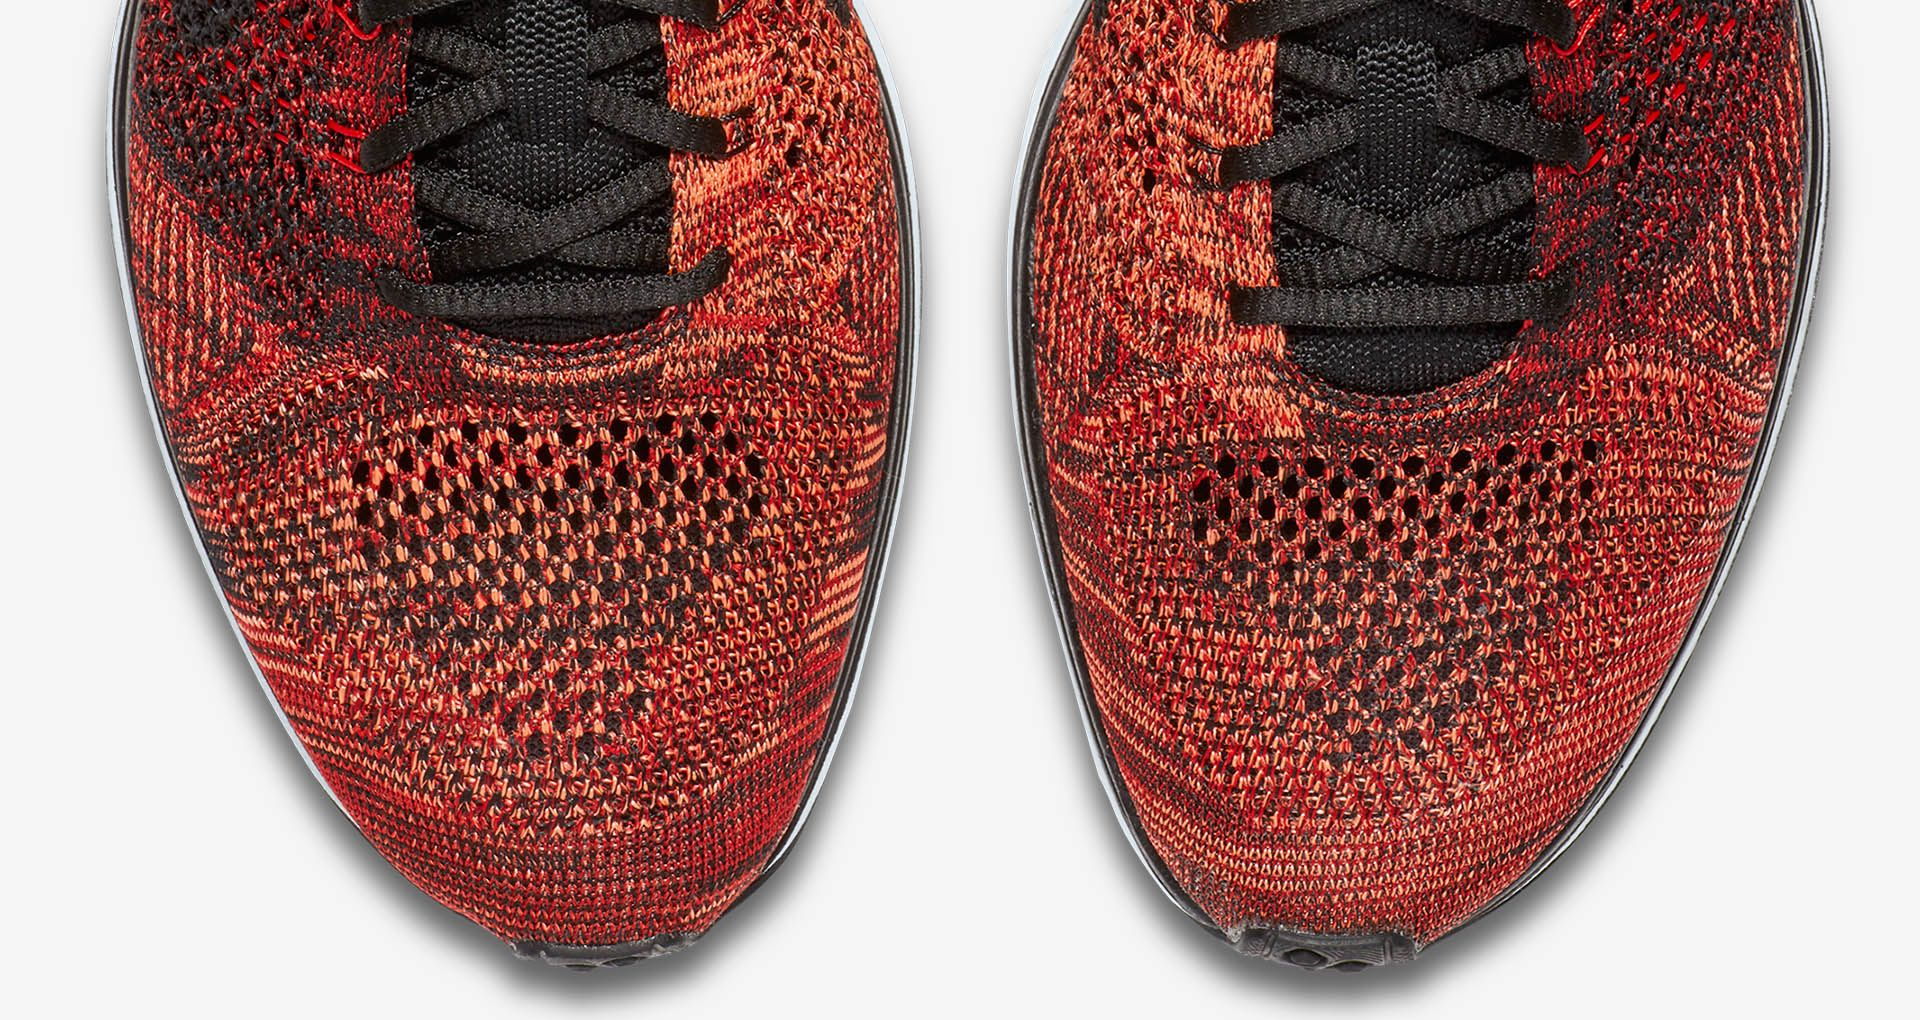 92cf834d343d Nike Flyknit Racer  University Red   Black  . Nike+ SNKRS